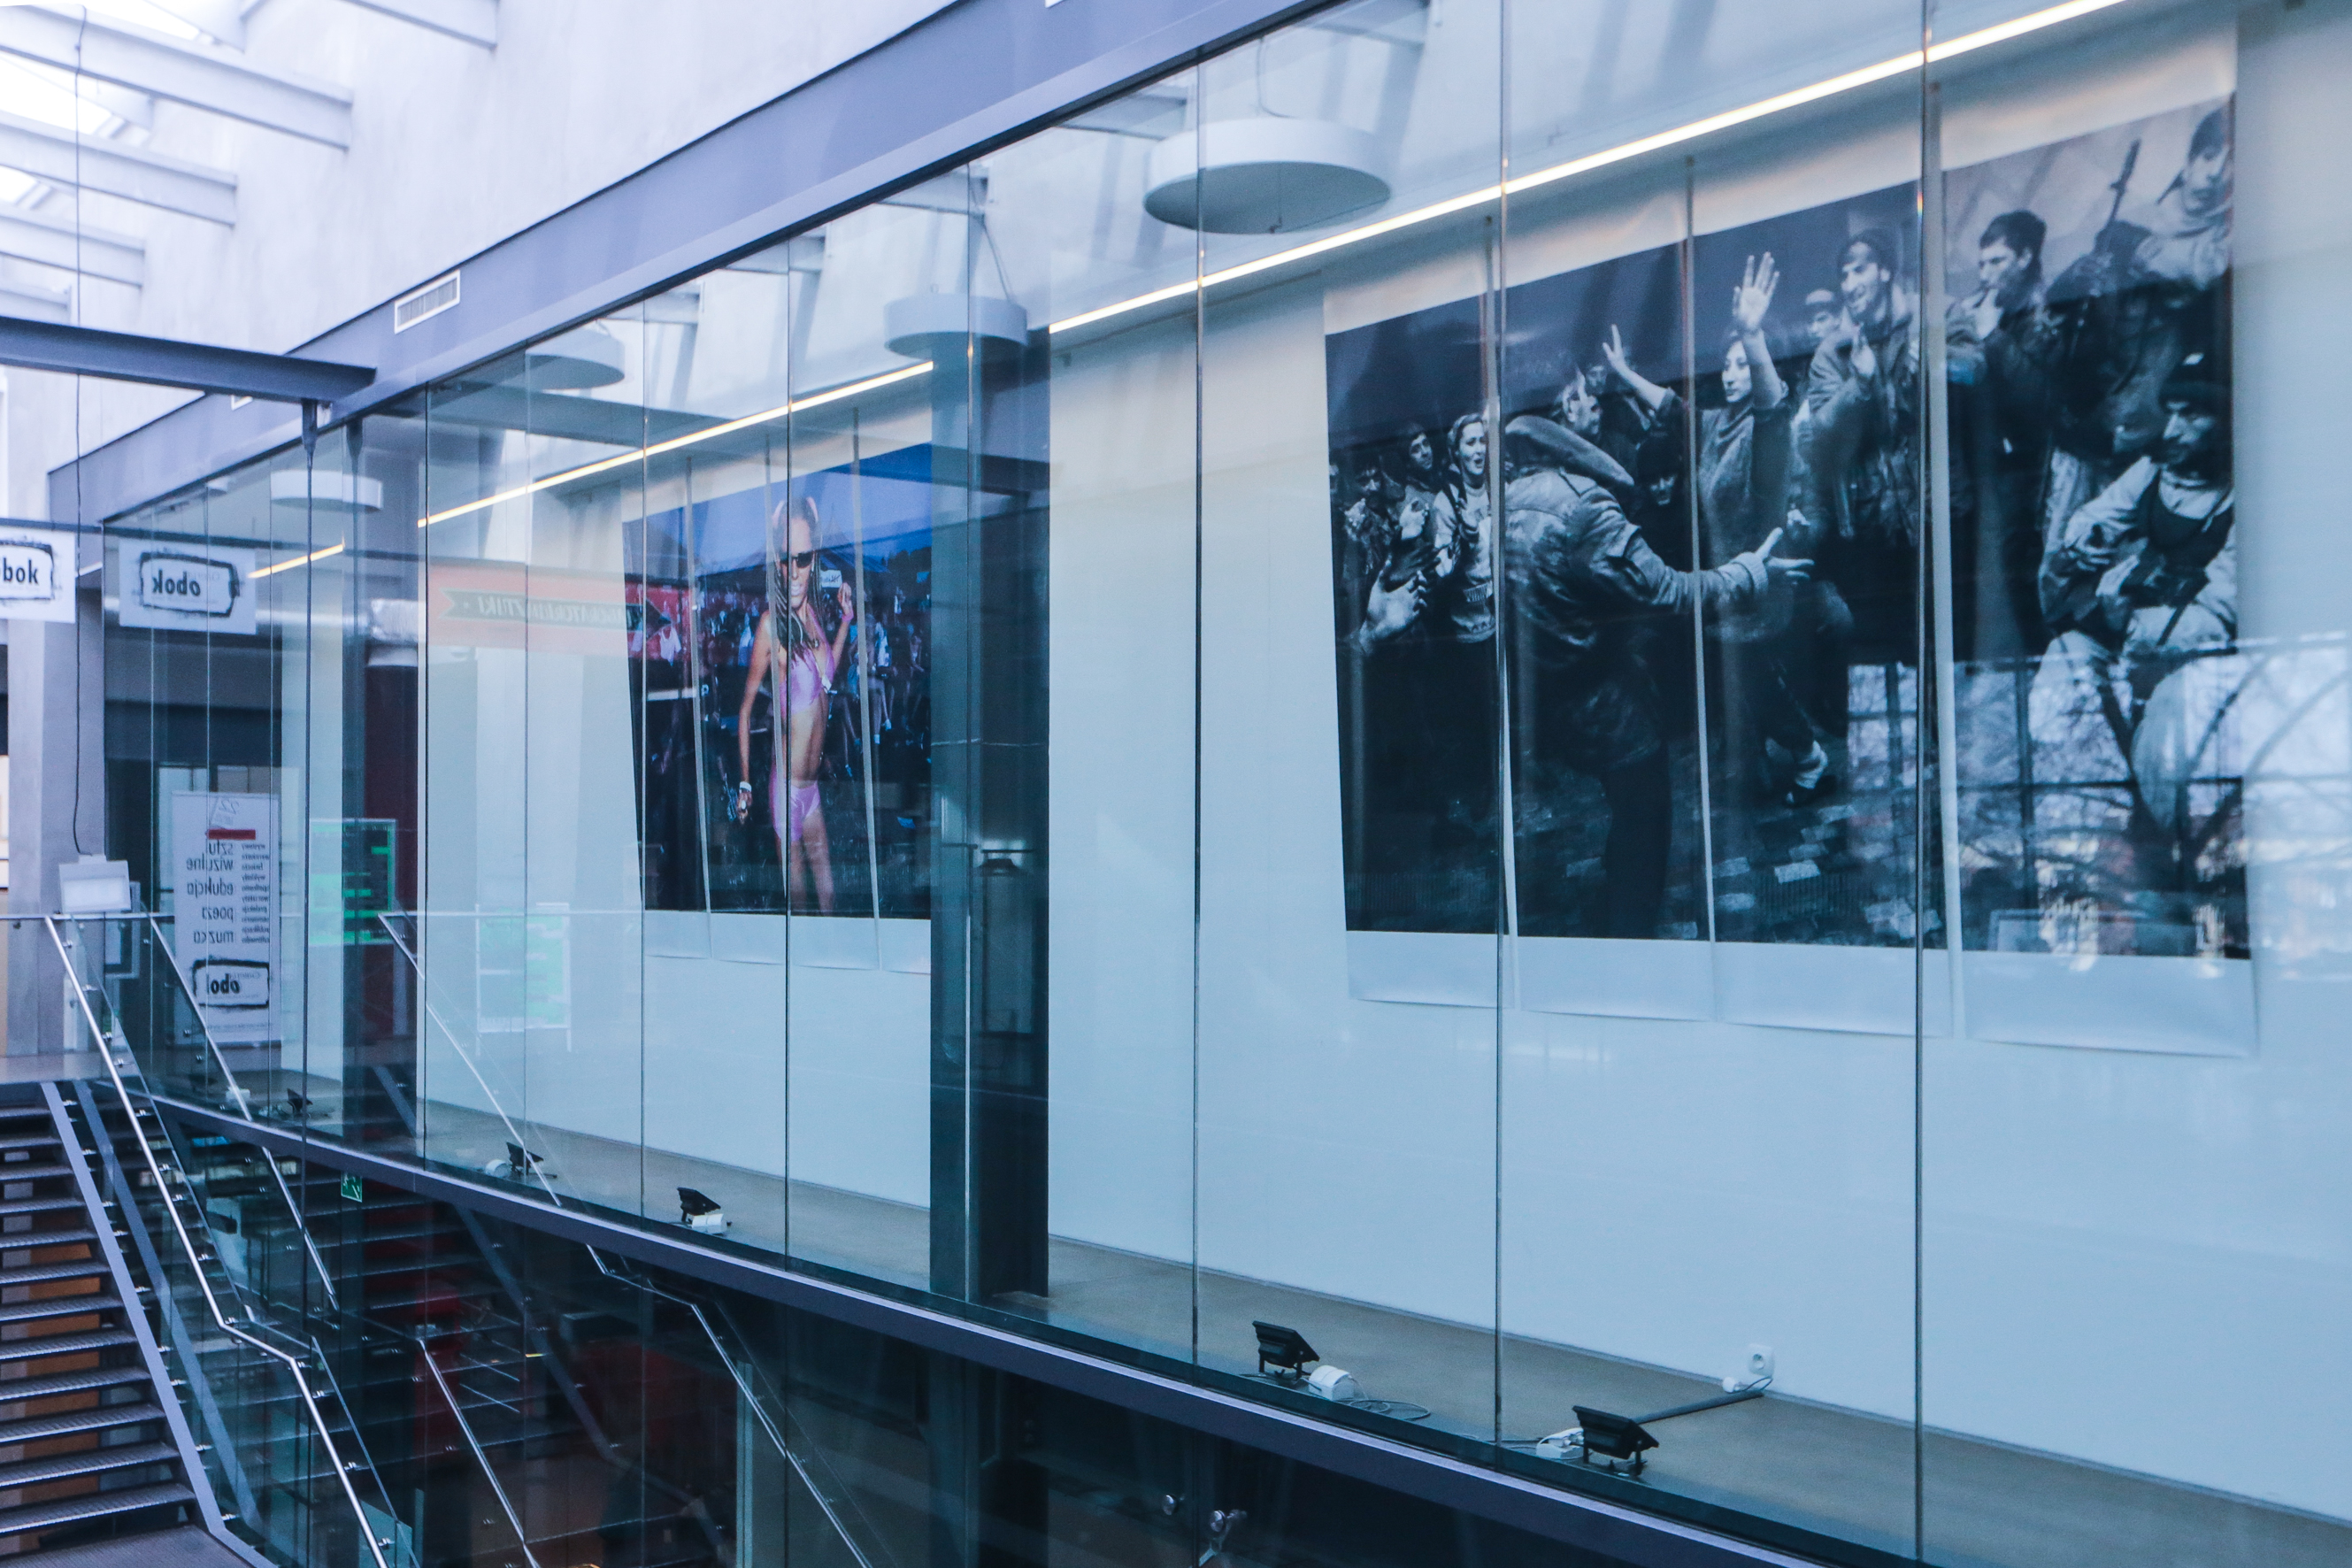 Wystawa w galerii Obok, M. Forecki, fot. Dominik Gajda